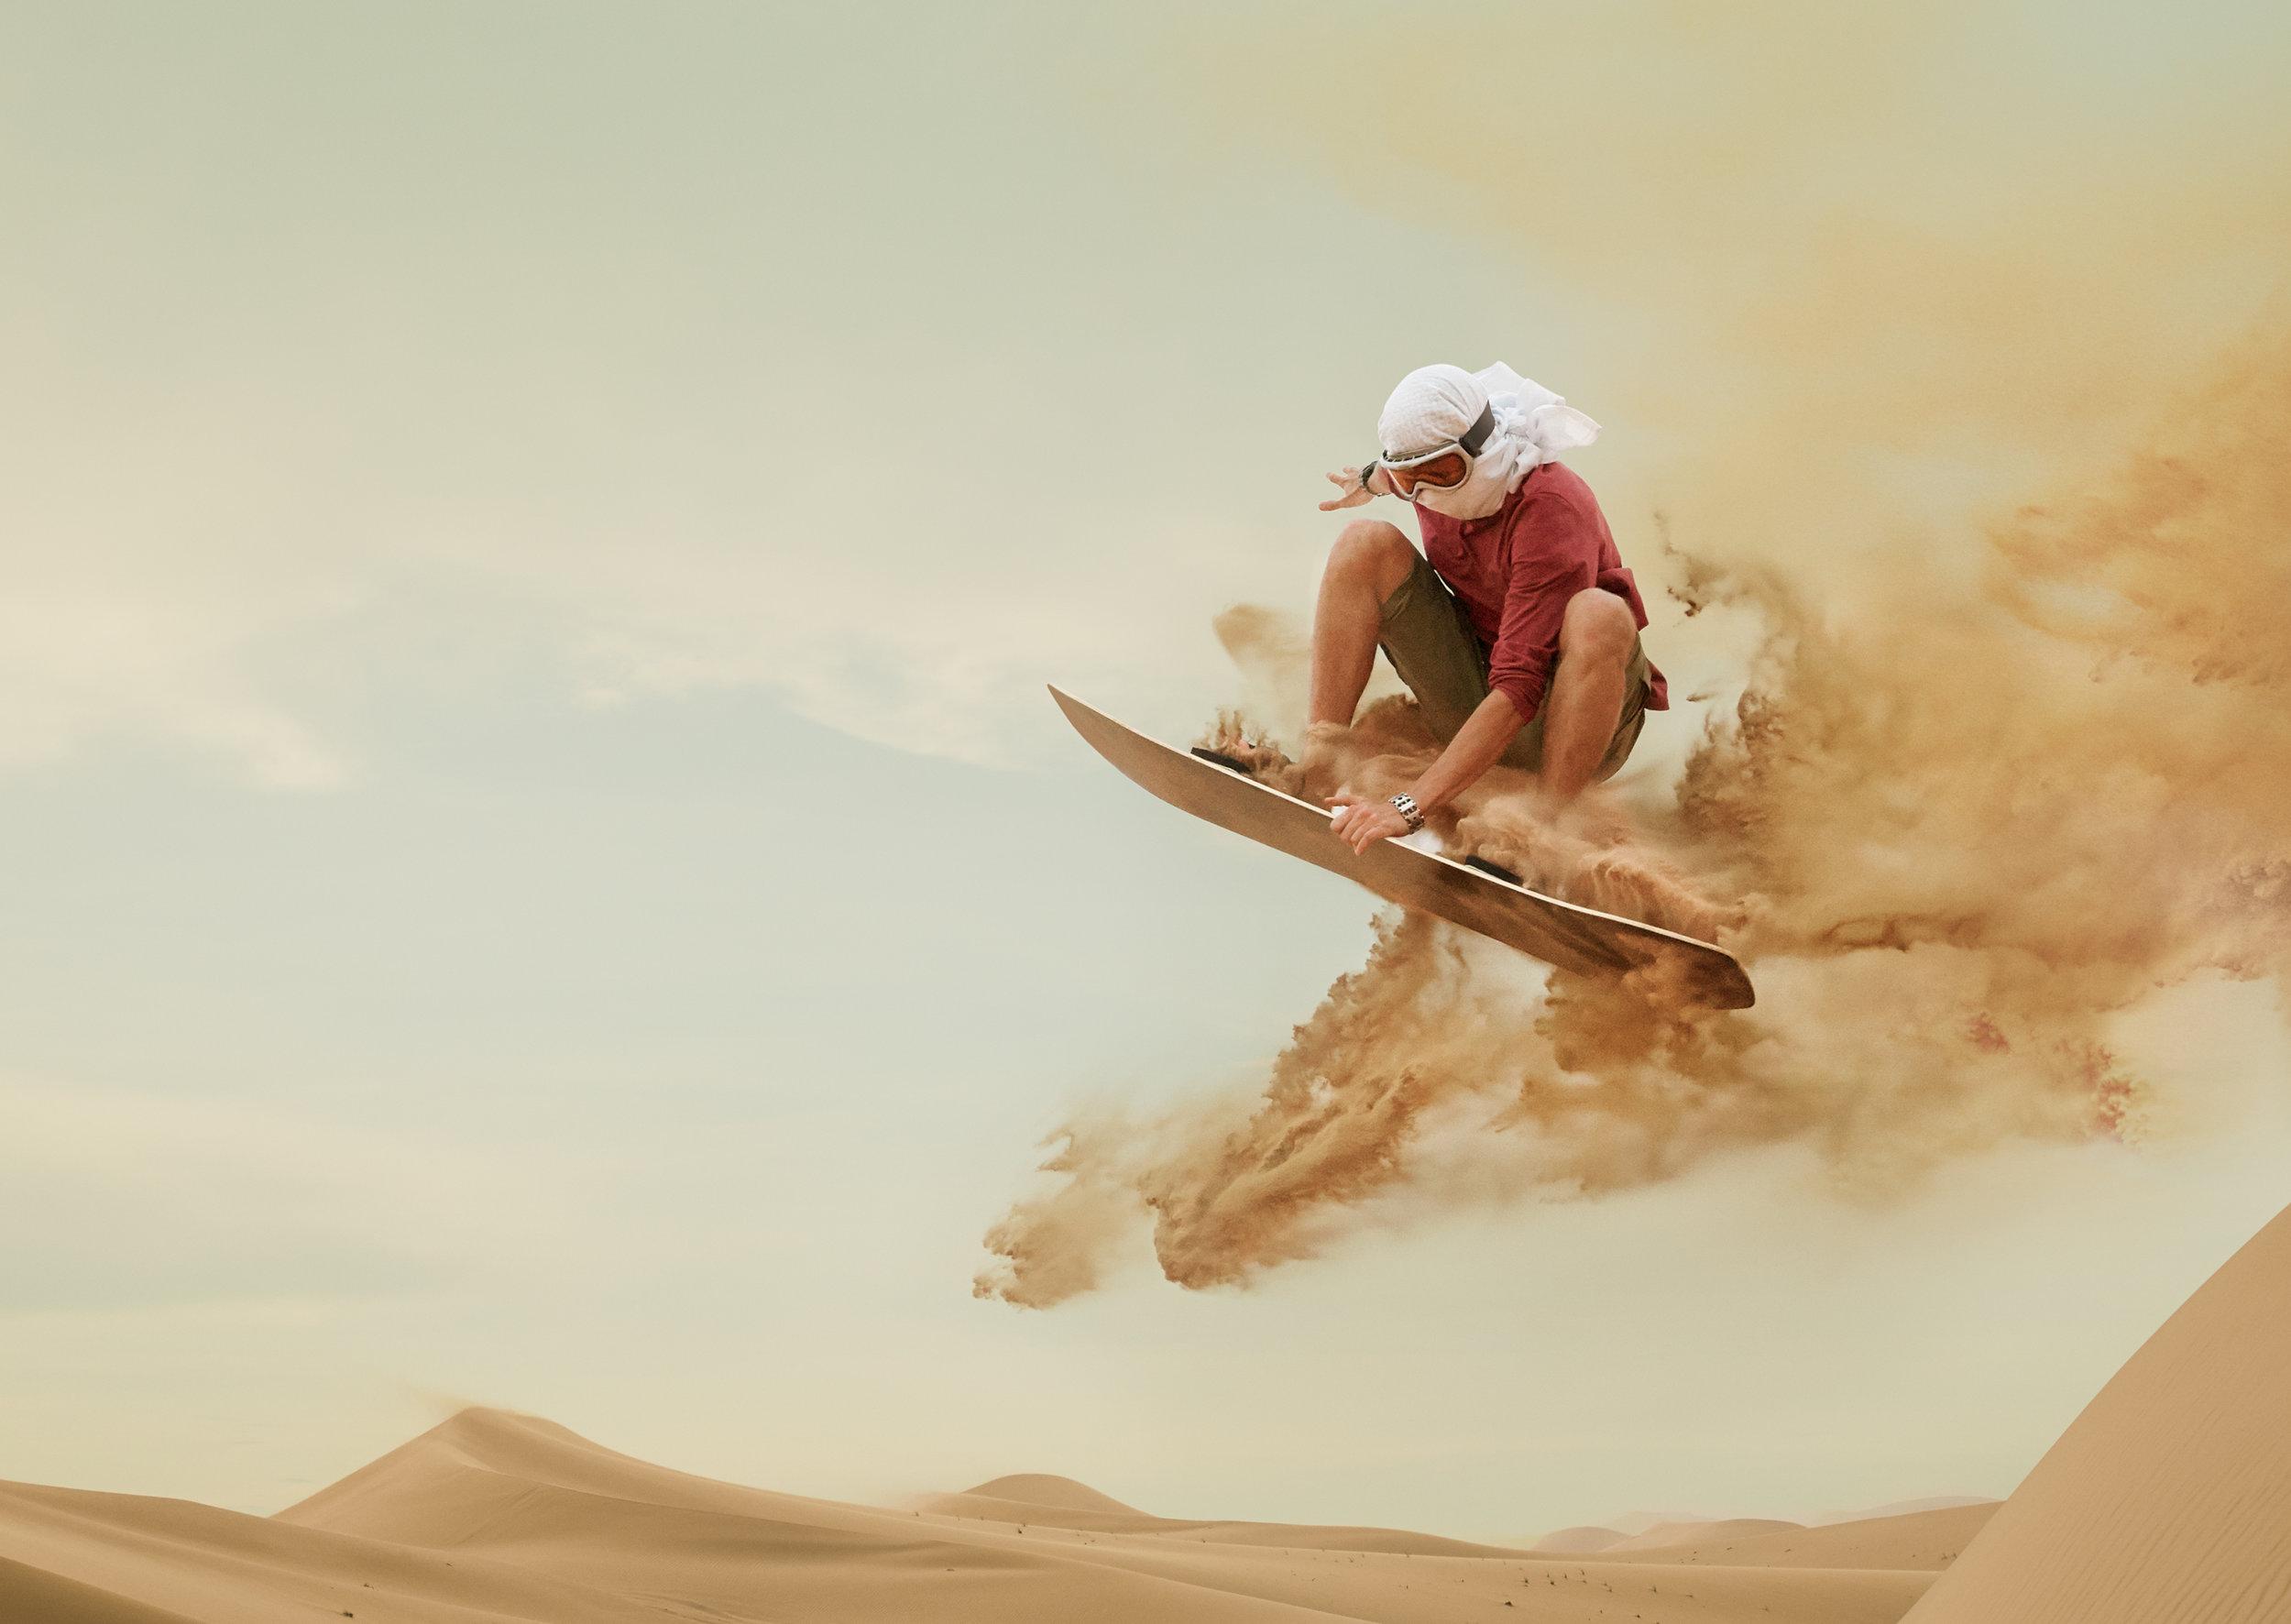 AbuDhabi_Day3_Sandboarding_0015_FinalTightCropped.jpg